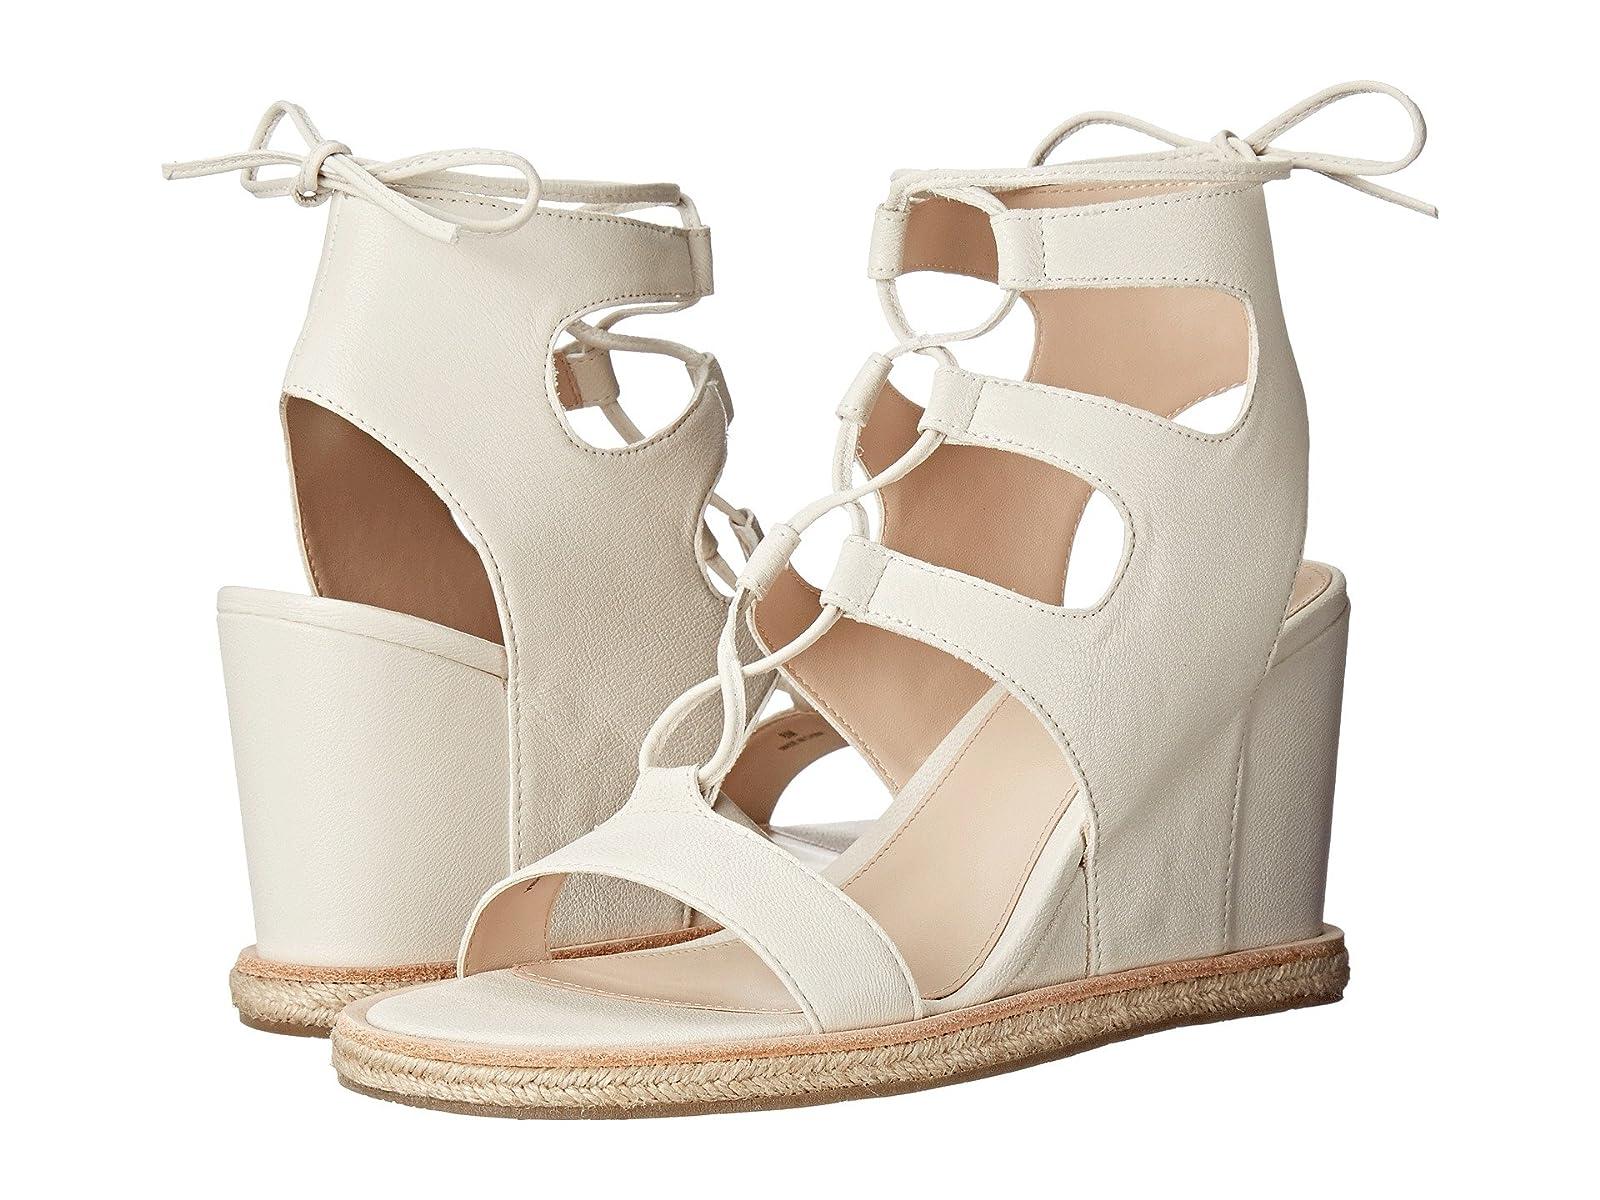 Pelle Moda KyraCheap and distinctive eye-catching shoes